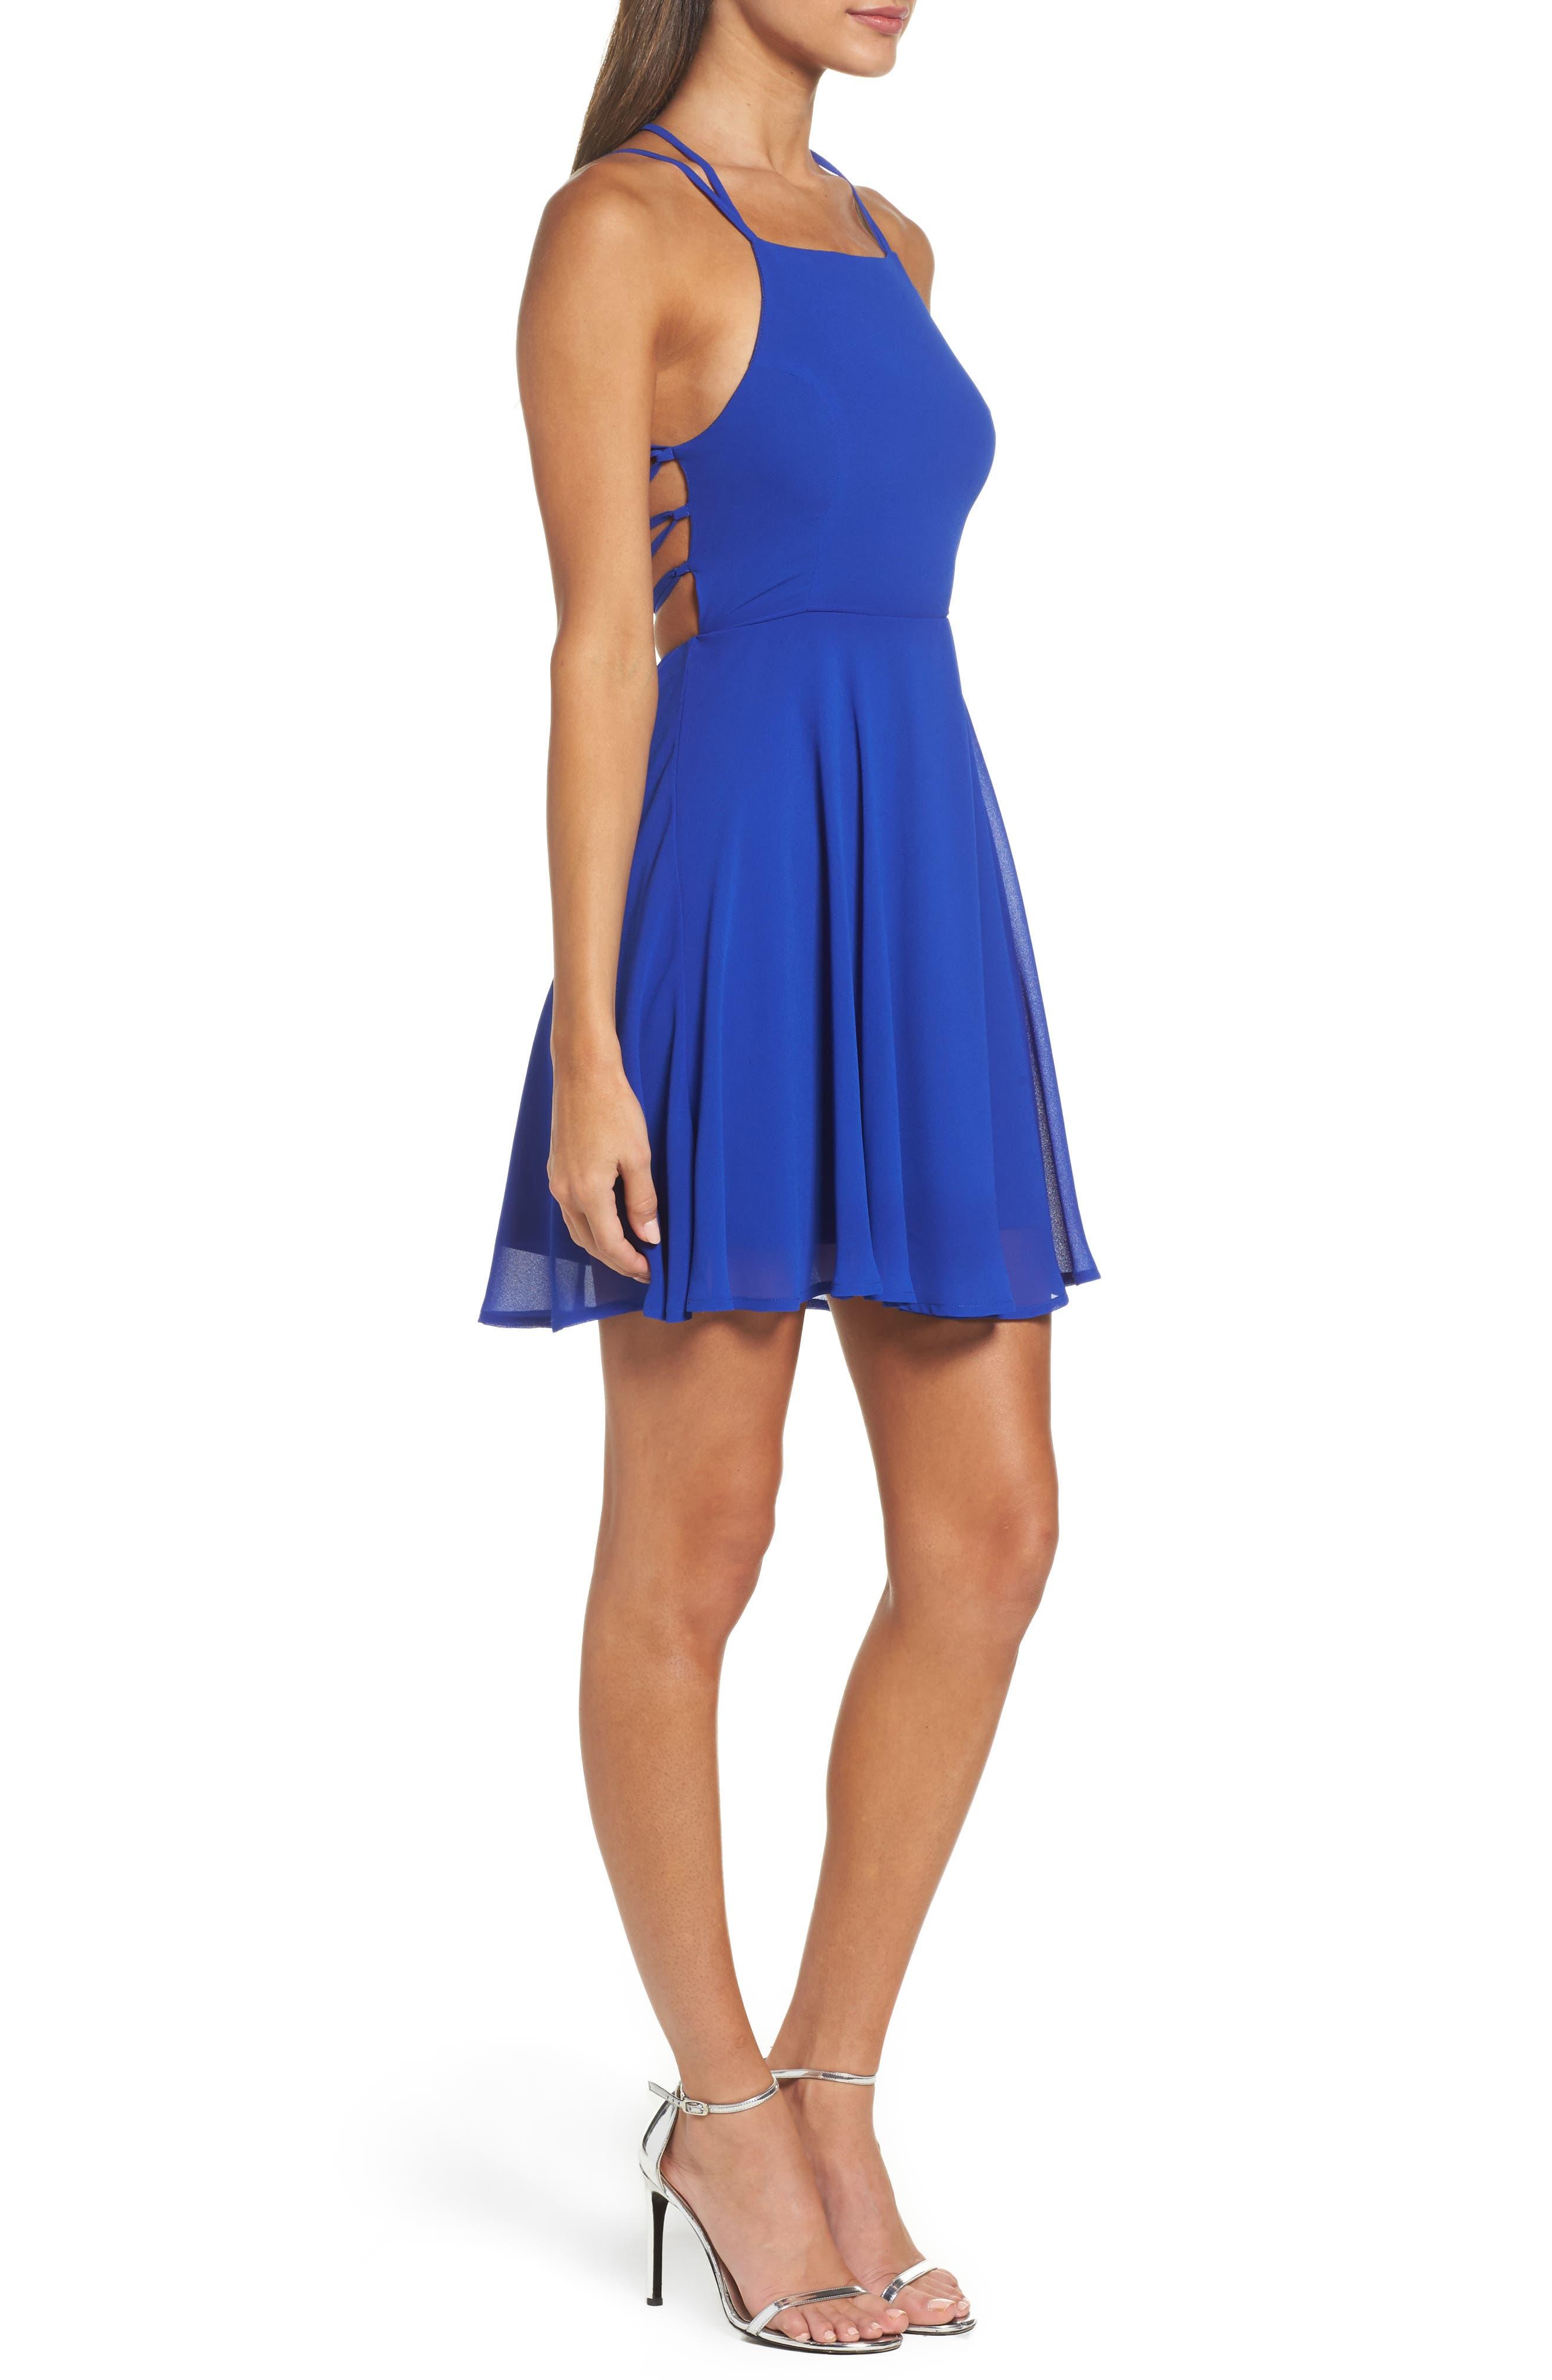 LULUS, Good Deeds Lace-Up Skater Dress, Alternate thumbnail 4, color, ROYAL BLUE